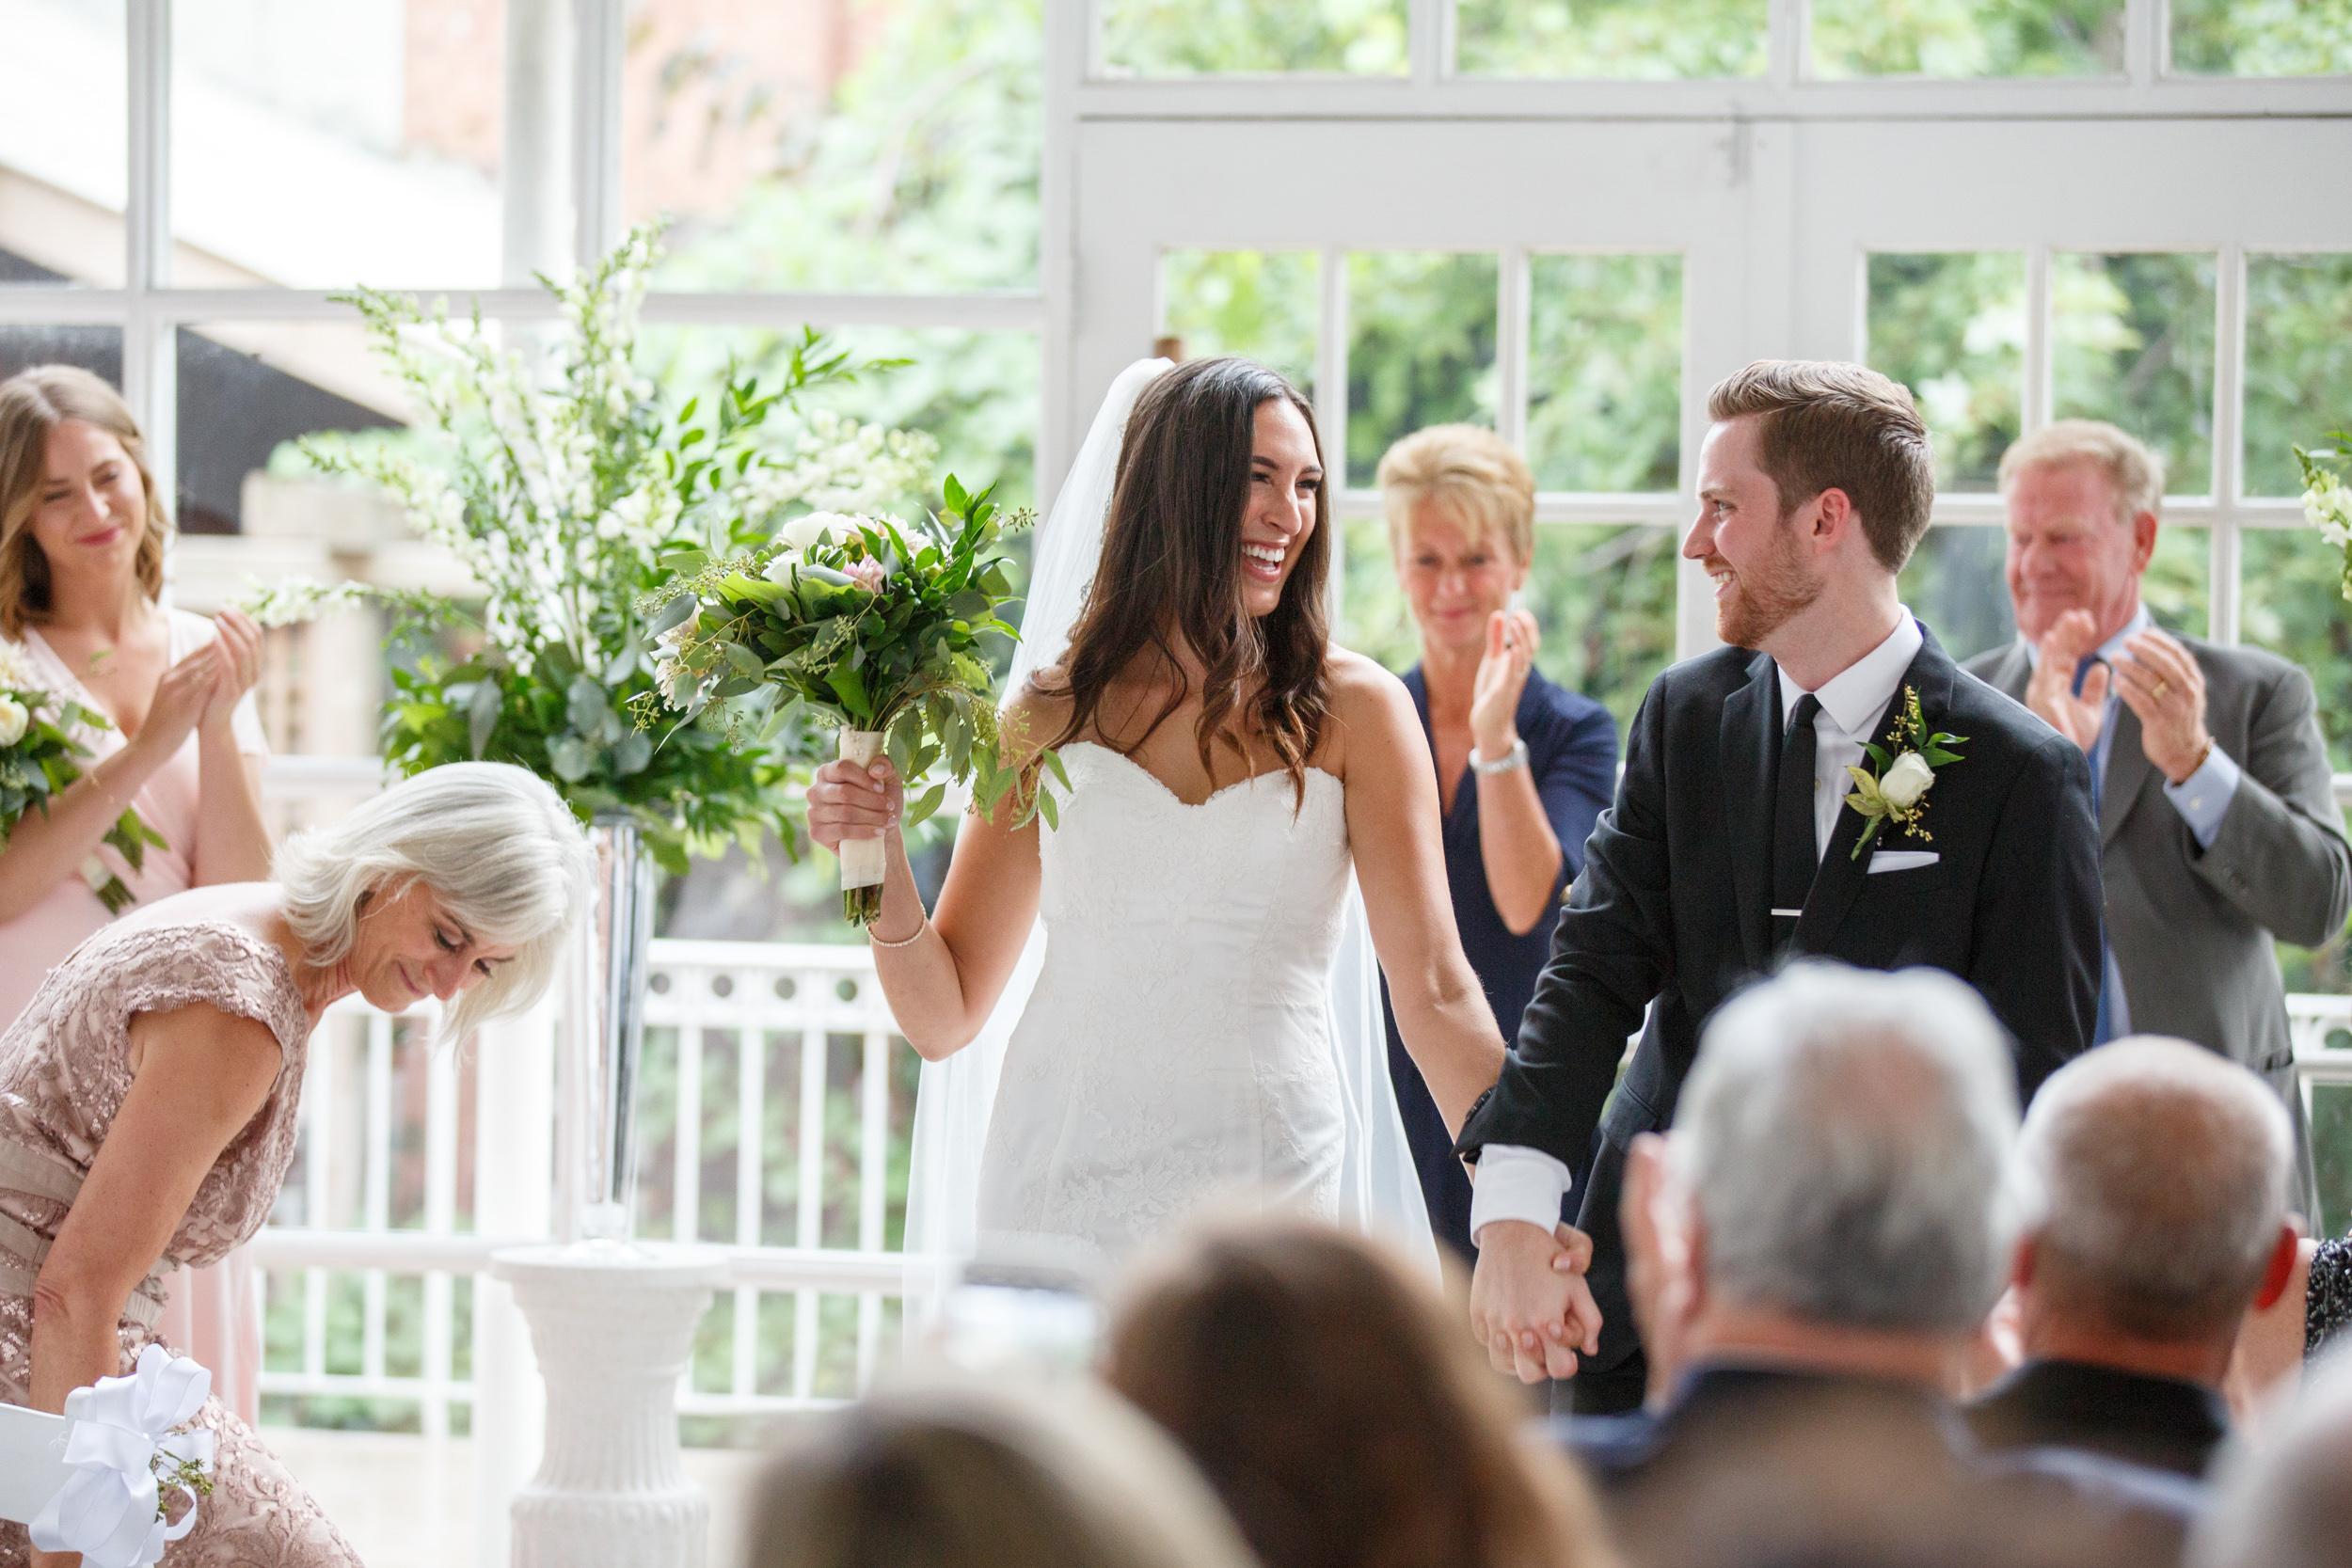 9-09-2016 Flora & Colin wedding photography by Brian Milo-159.jpg